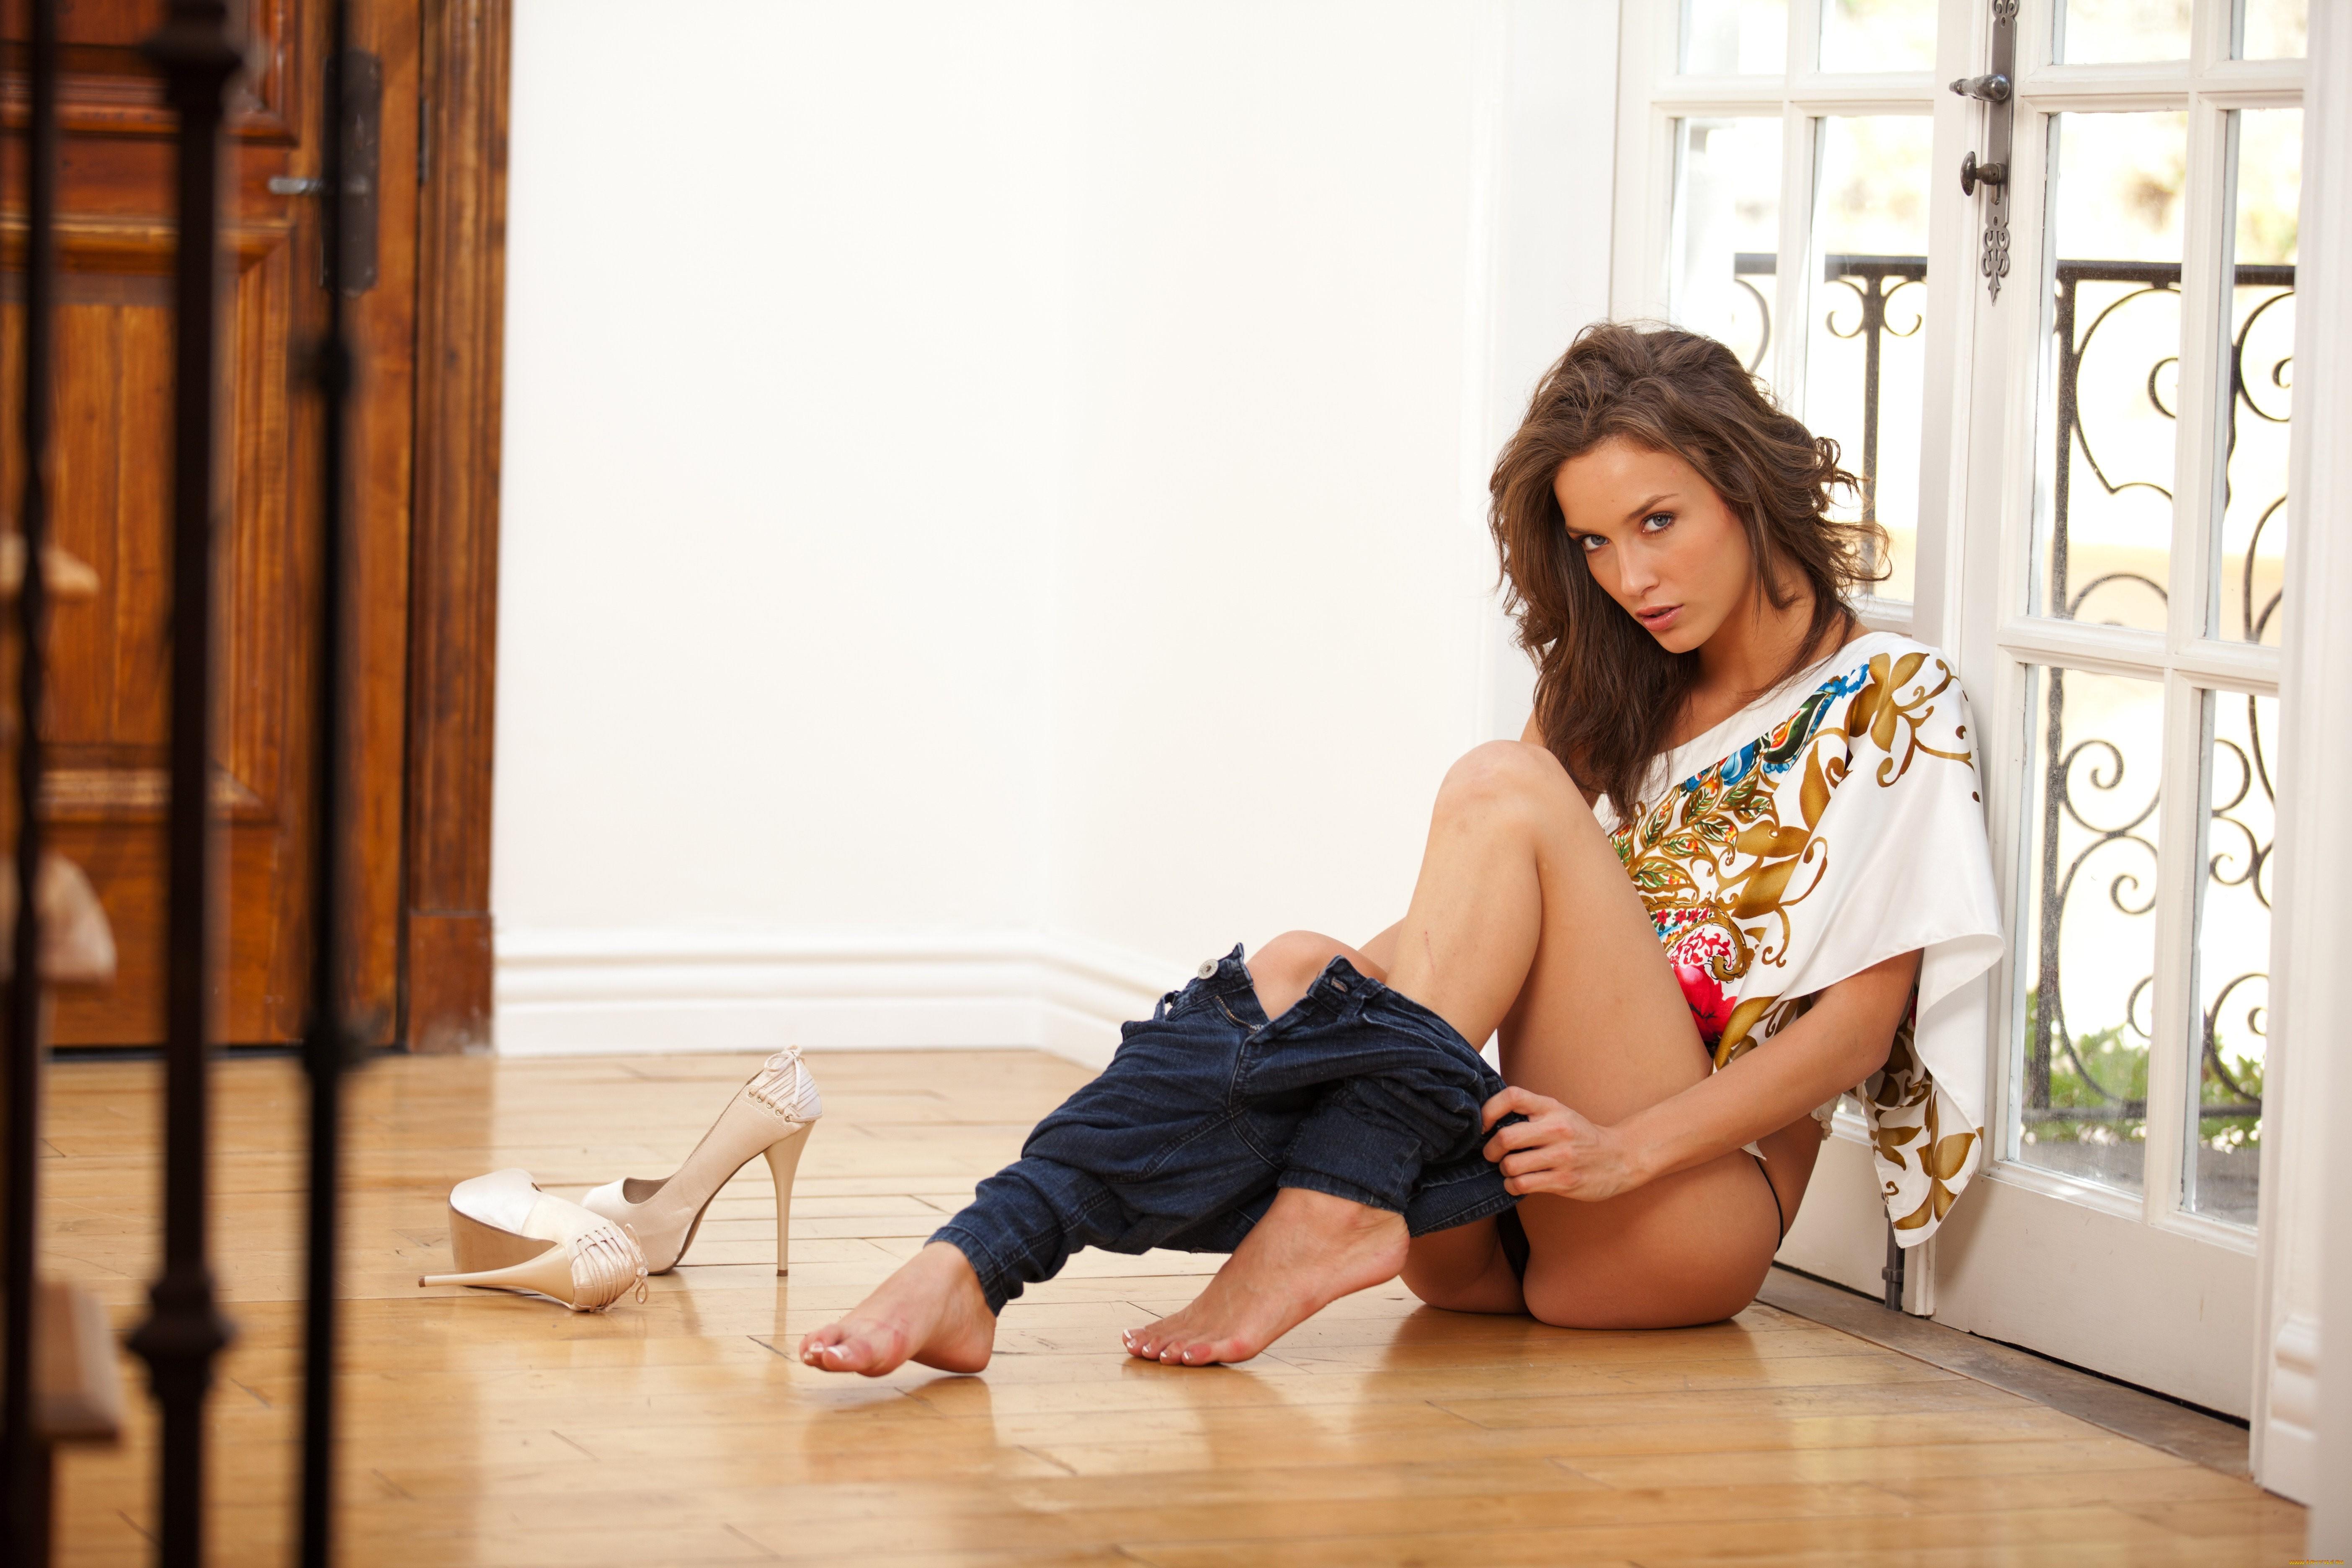 девушка снимает одежду фотки фото